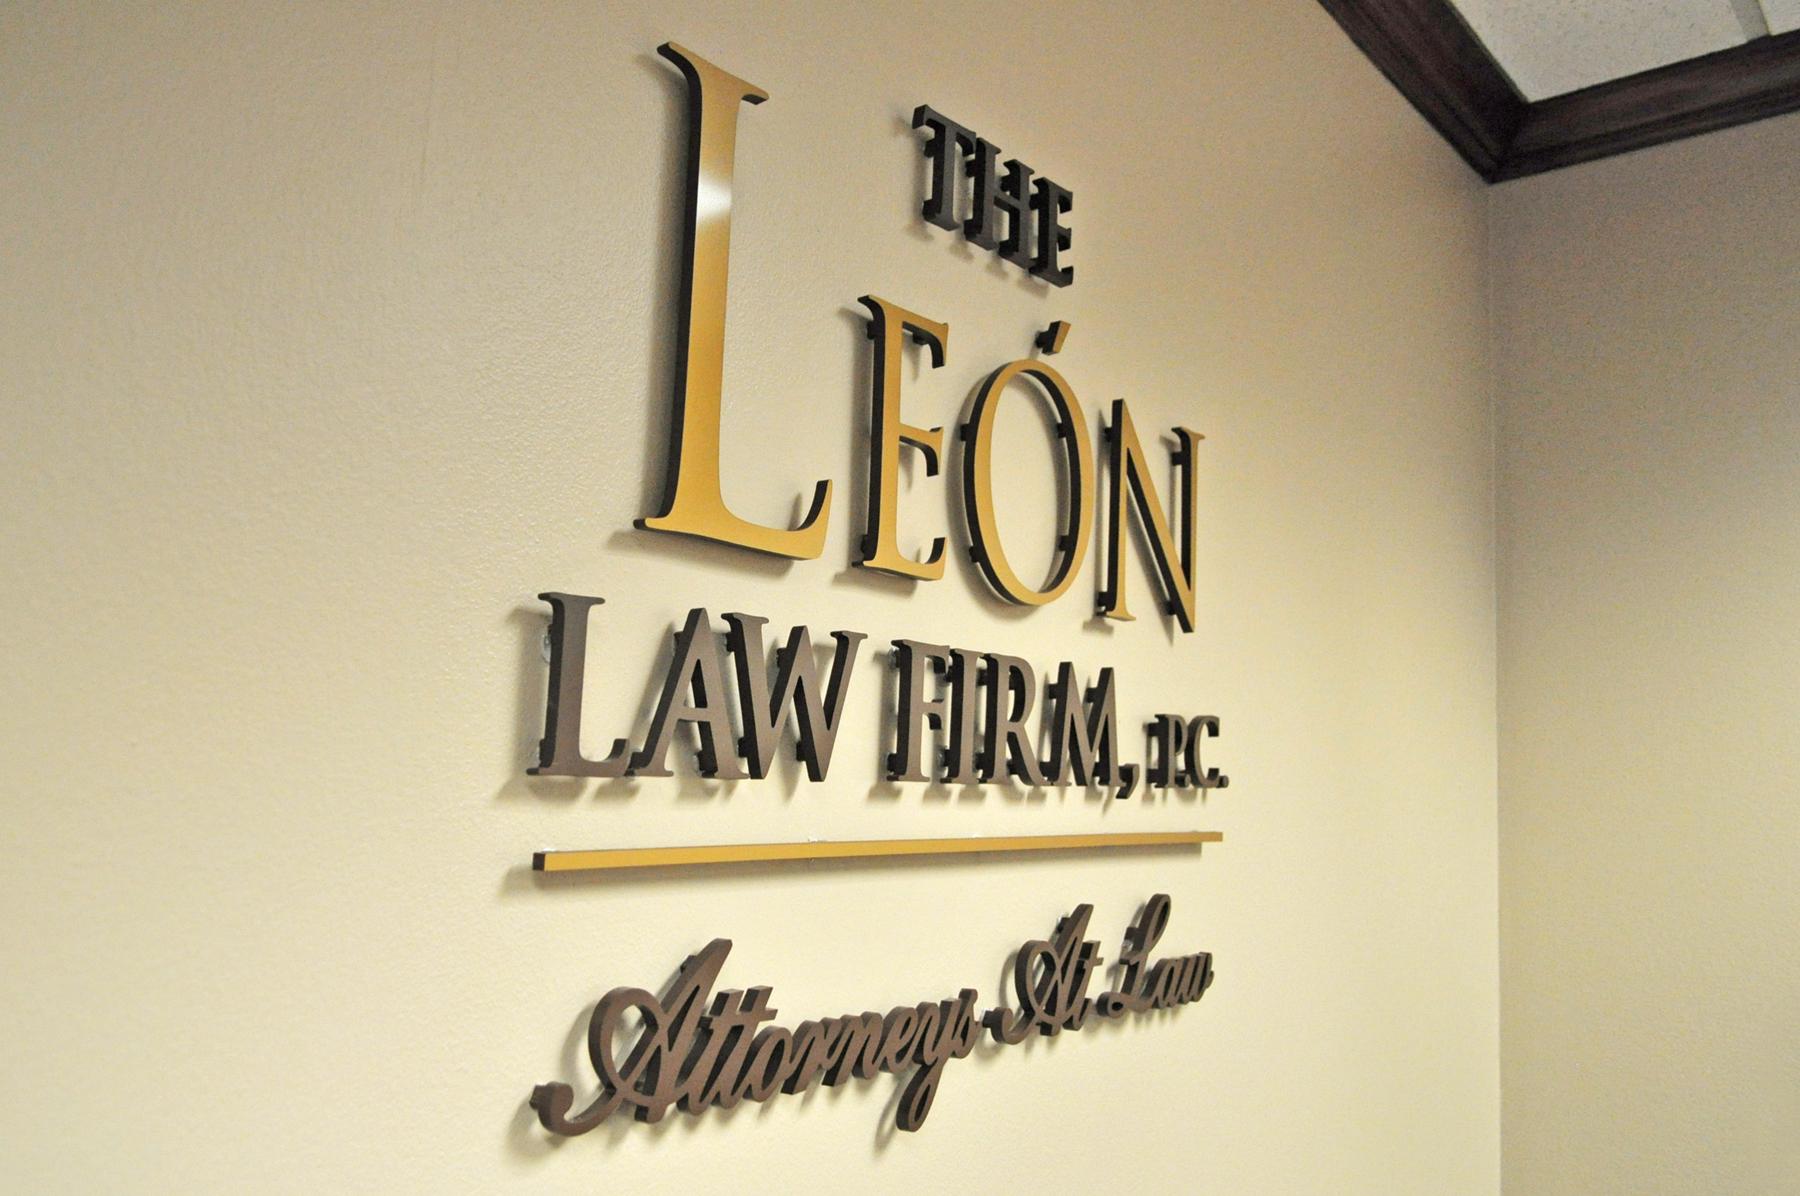 LeonLawFirm.jpg